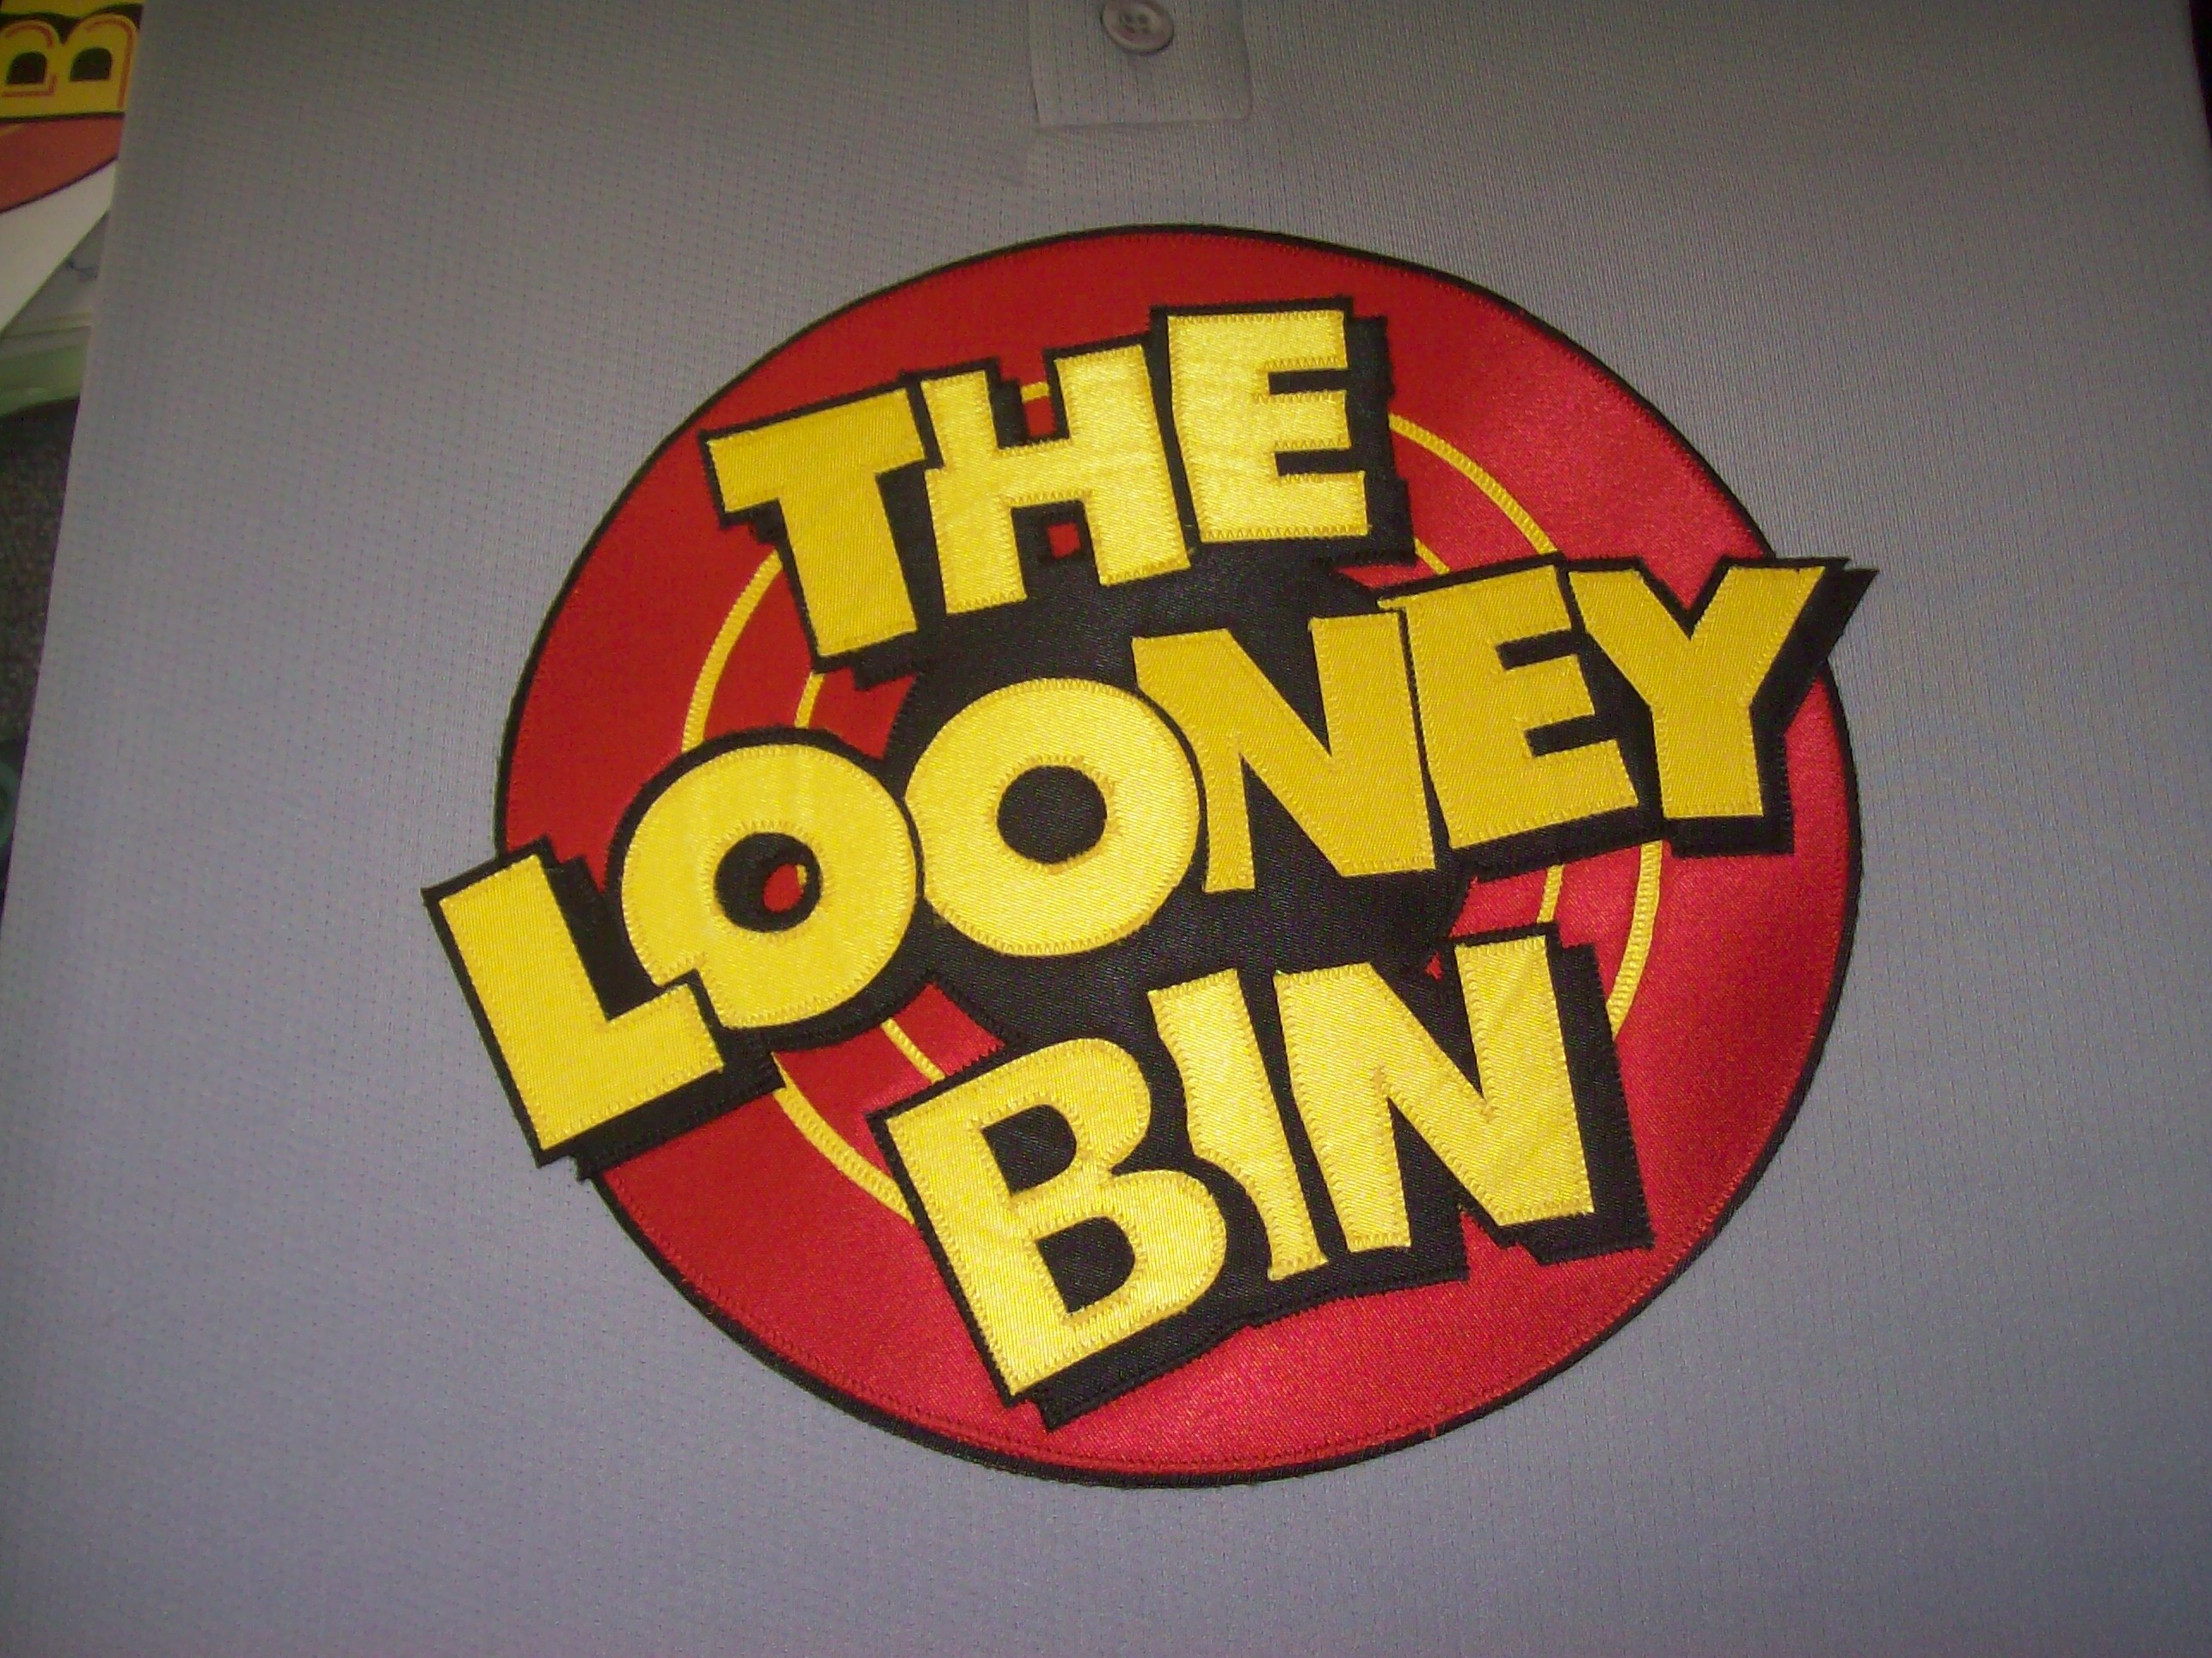 Looney_Bin_Front